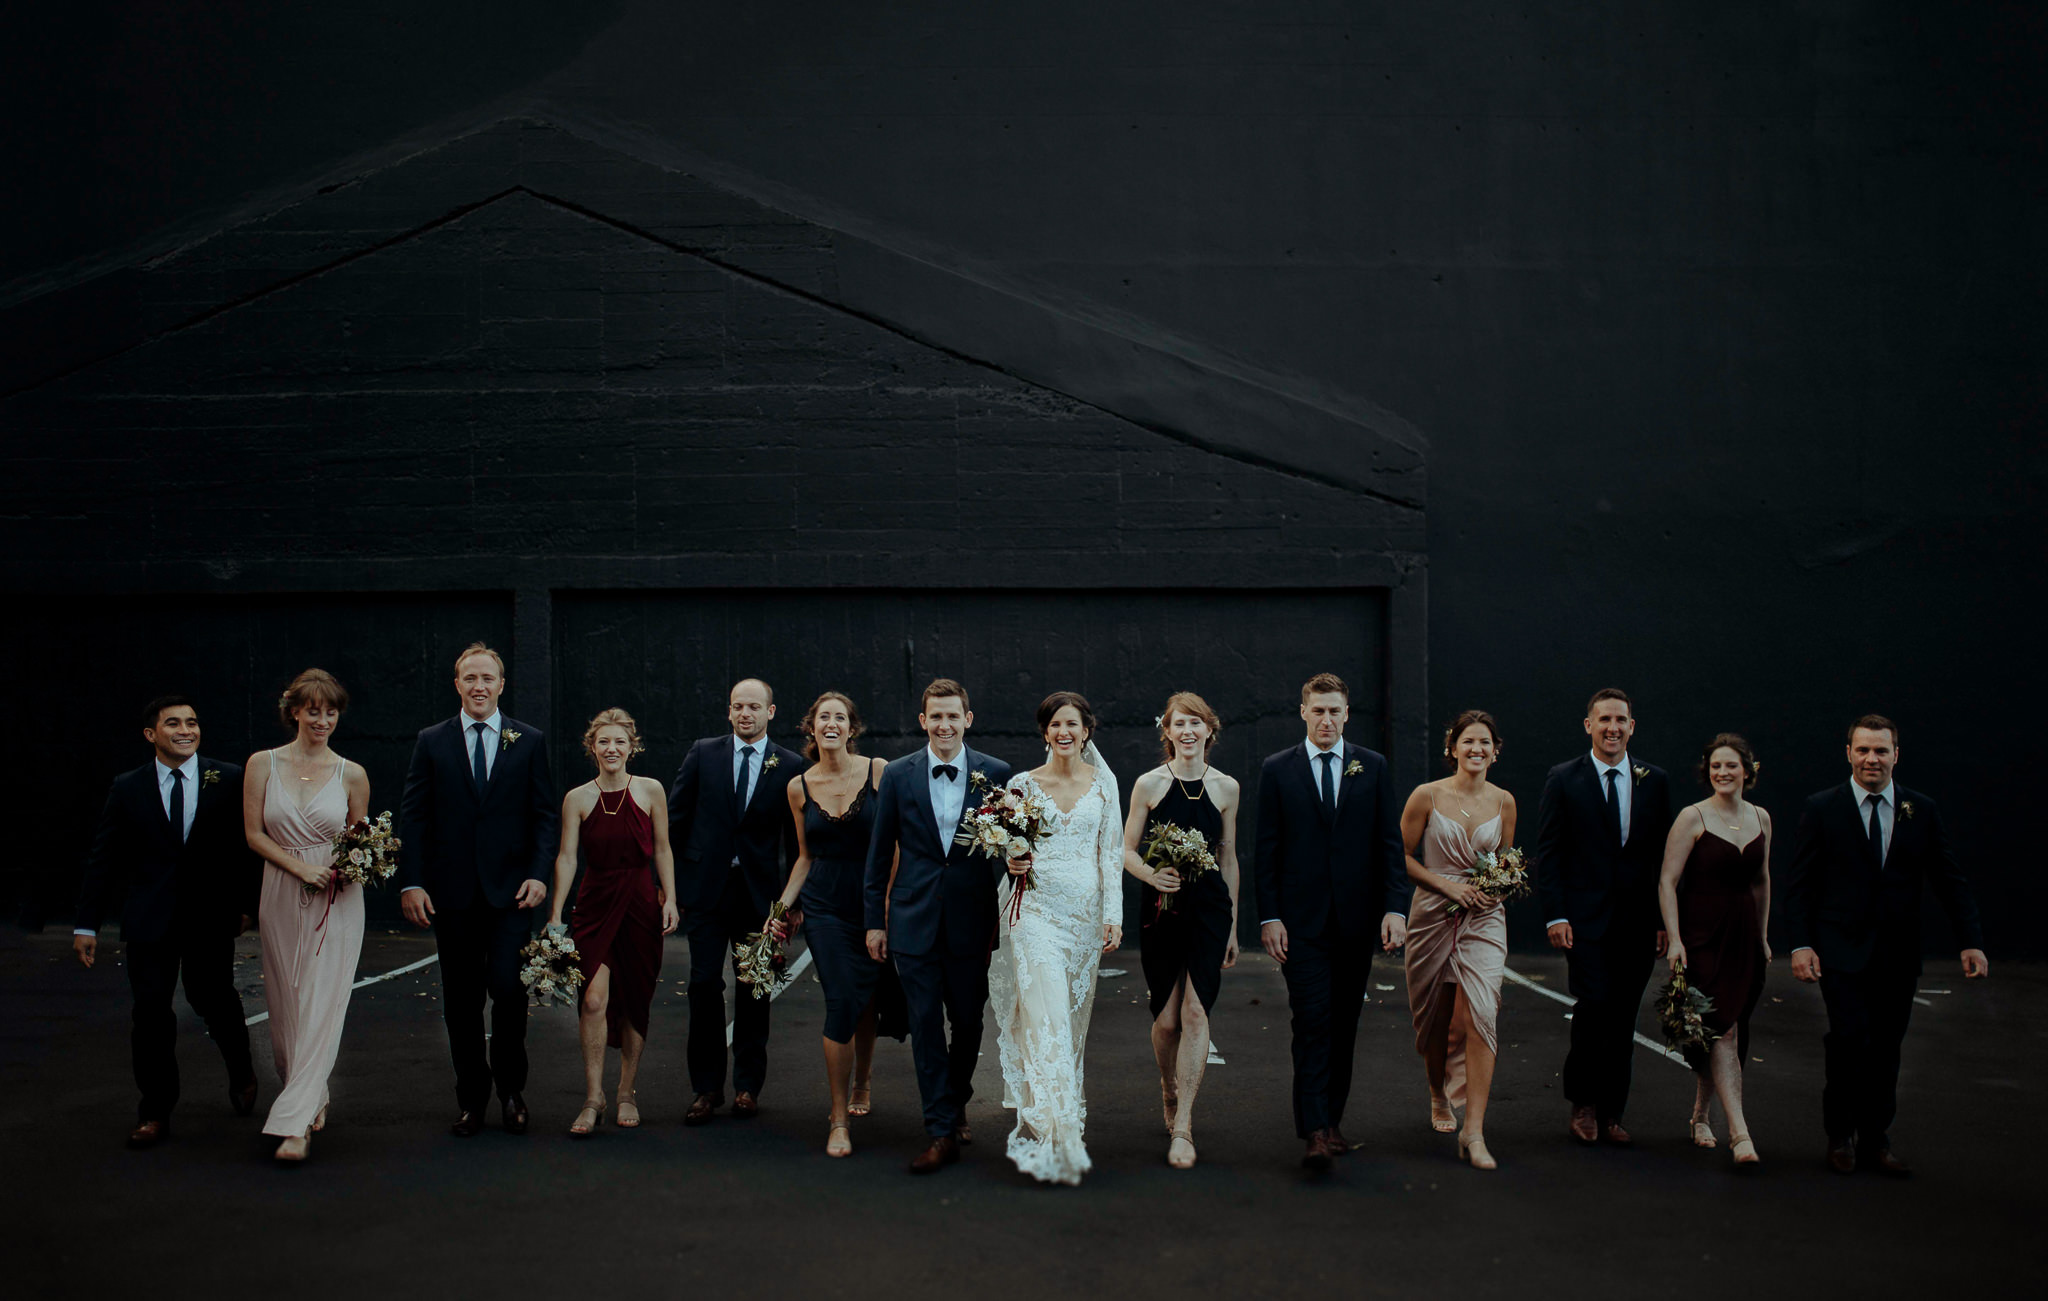 161008 Dan and Camilla wedding.jpg